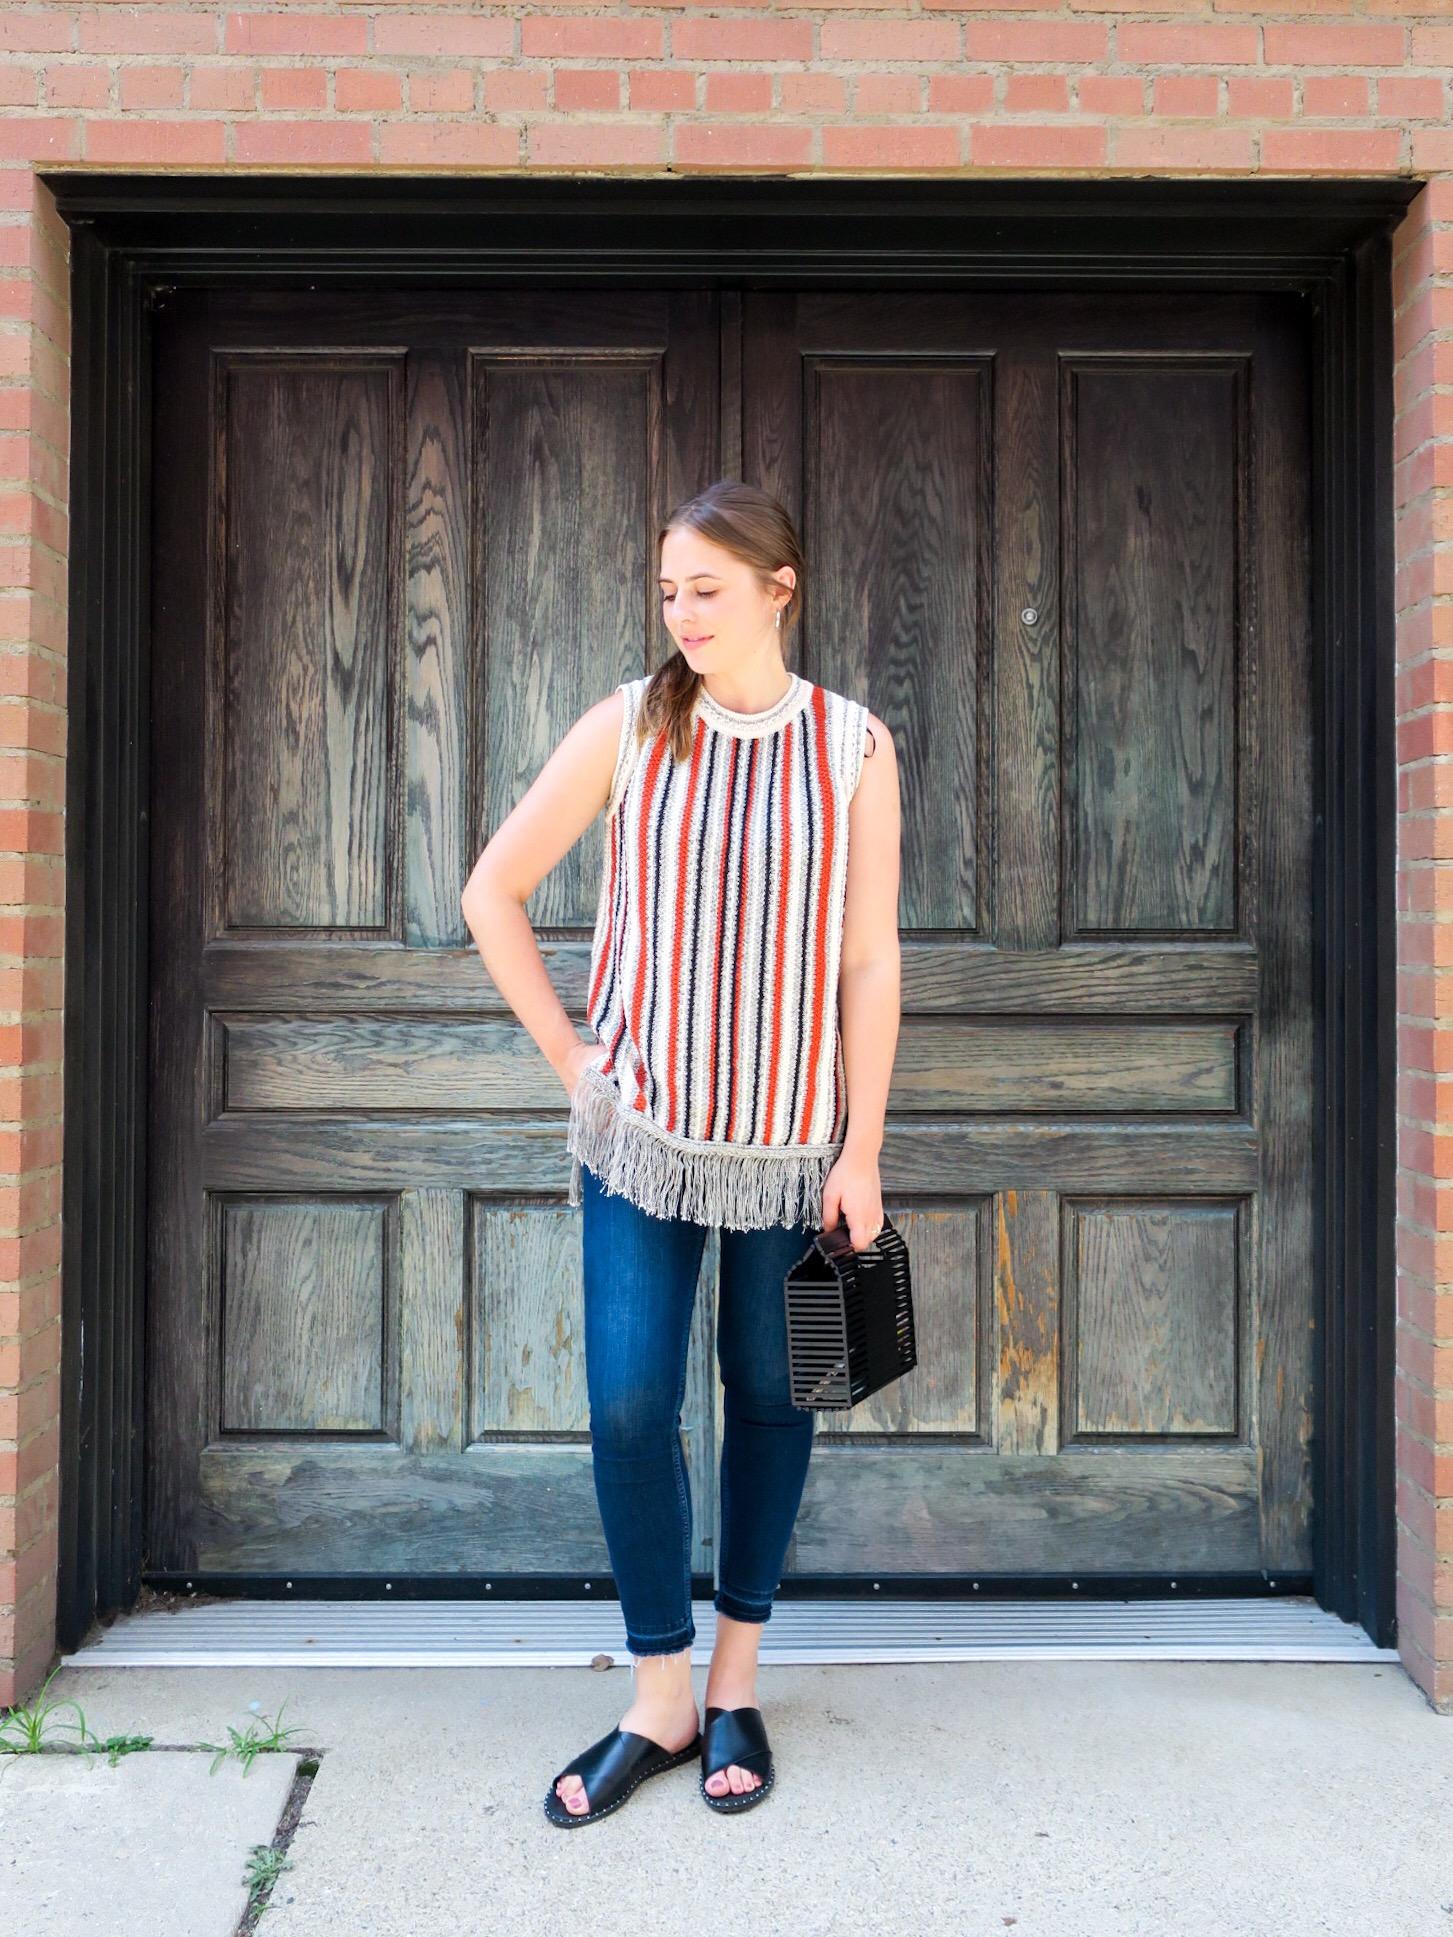 fashion by day pre-fall style.JPEG